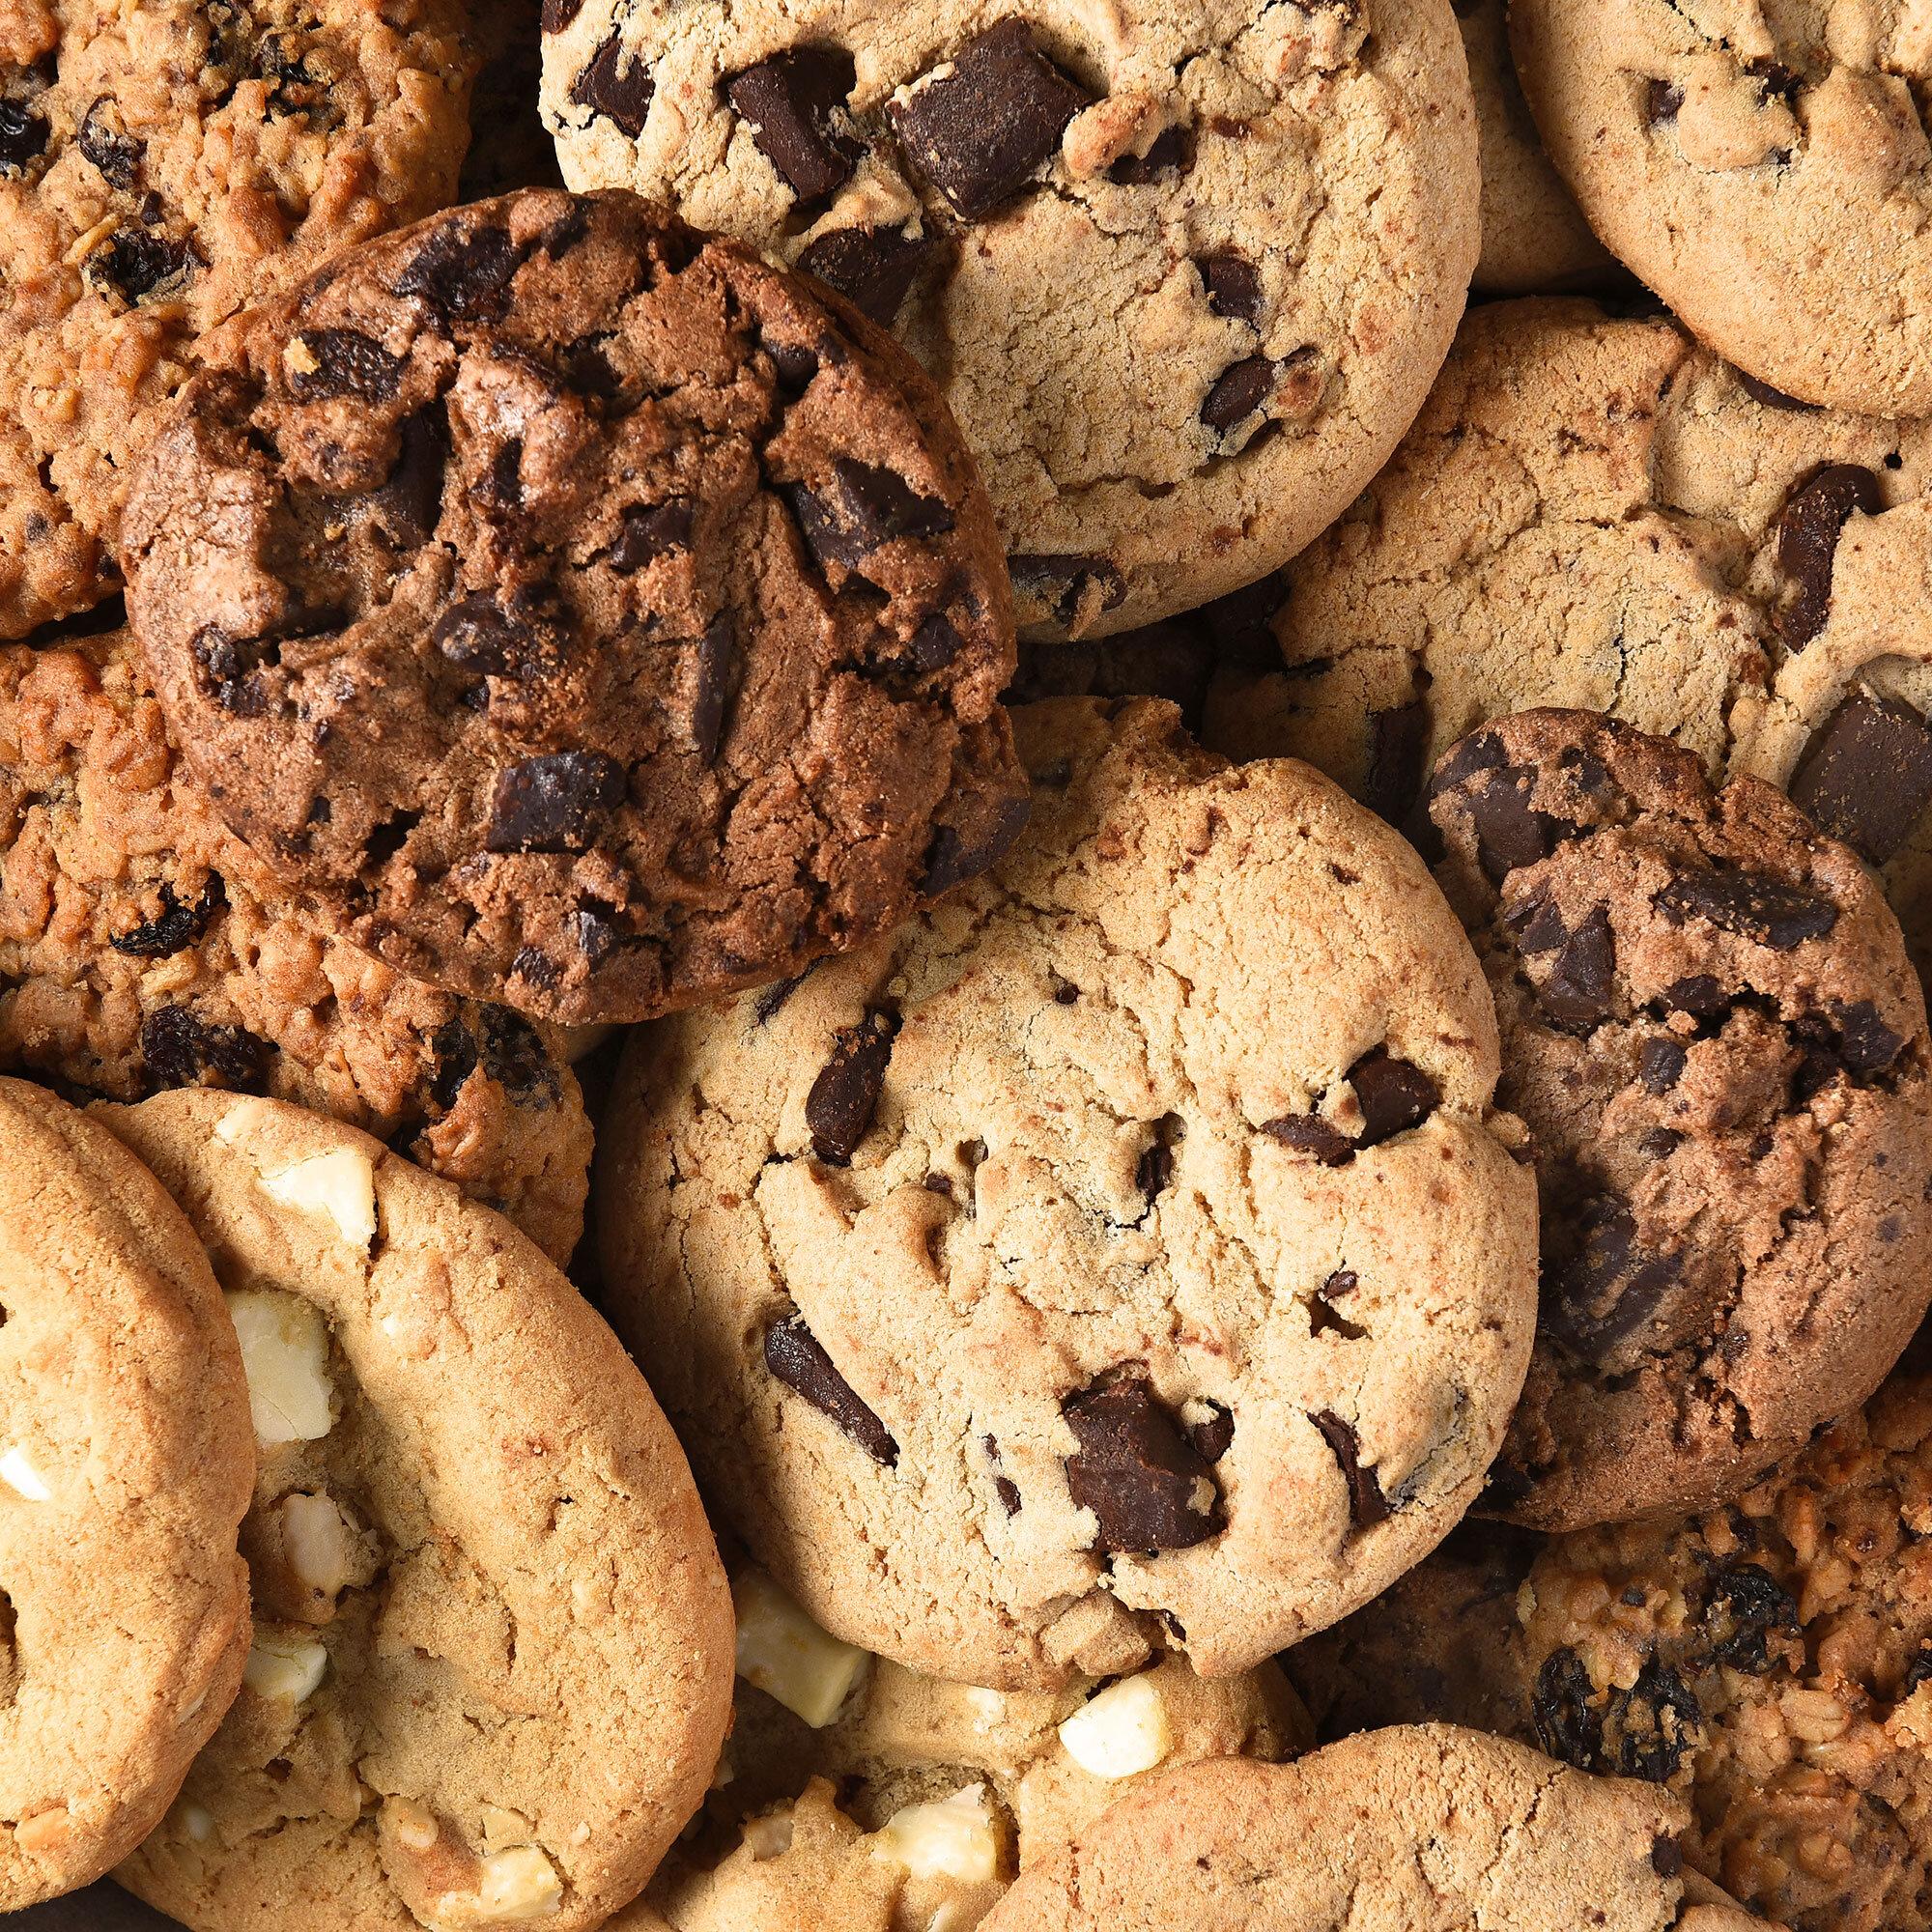 https://www.hybrisonline.se/pub_docs/files/Cookies/CookiesShirtstore.jpg